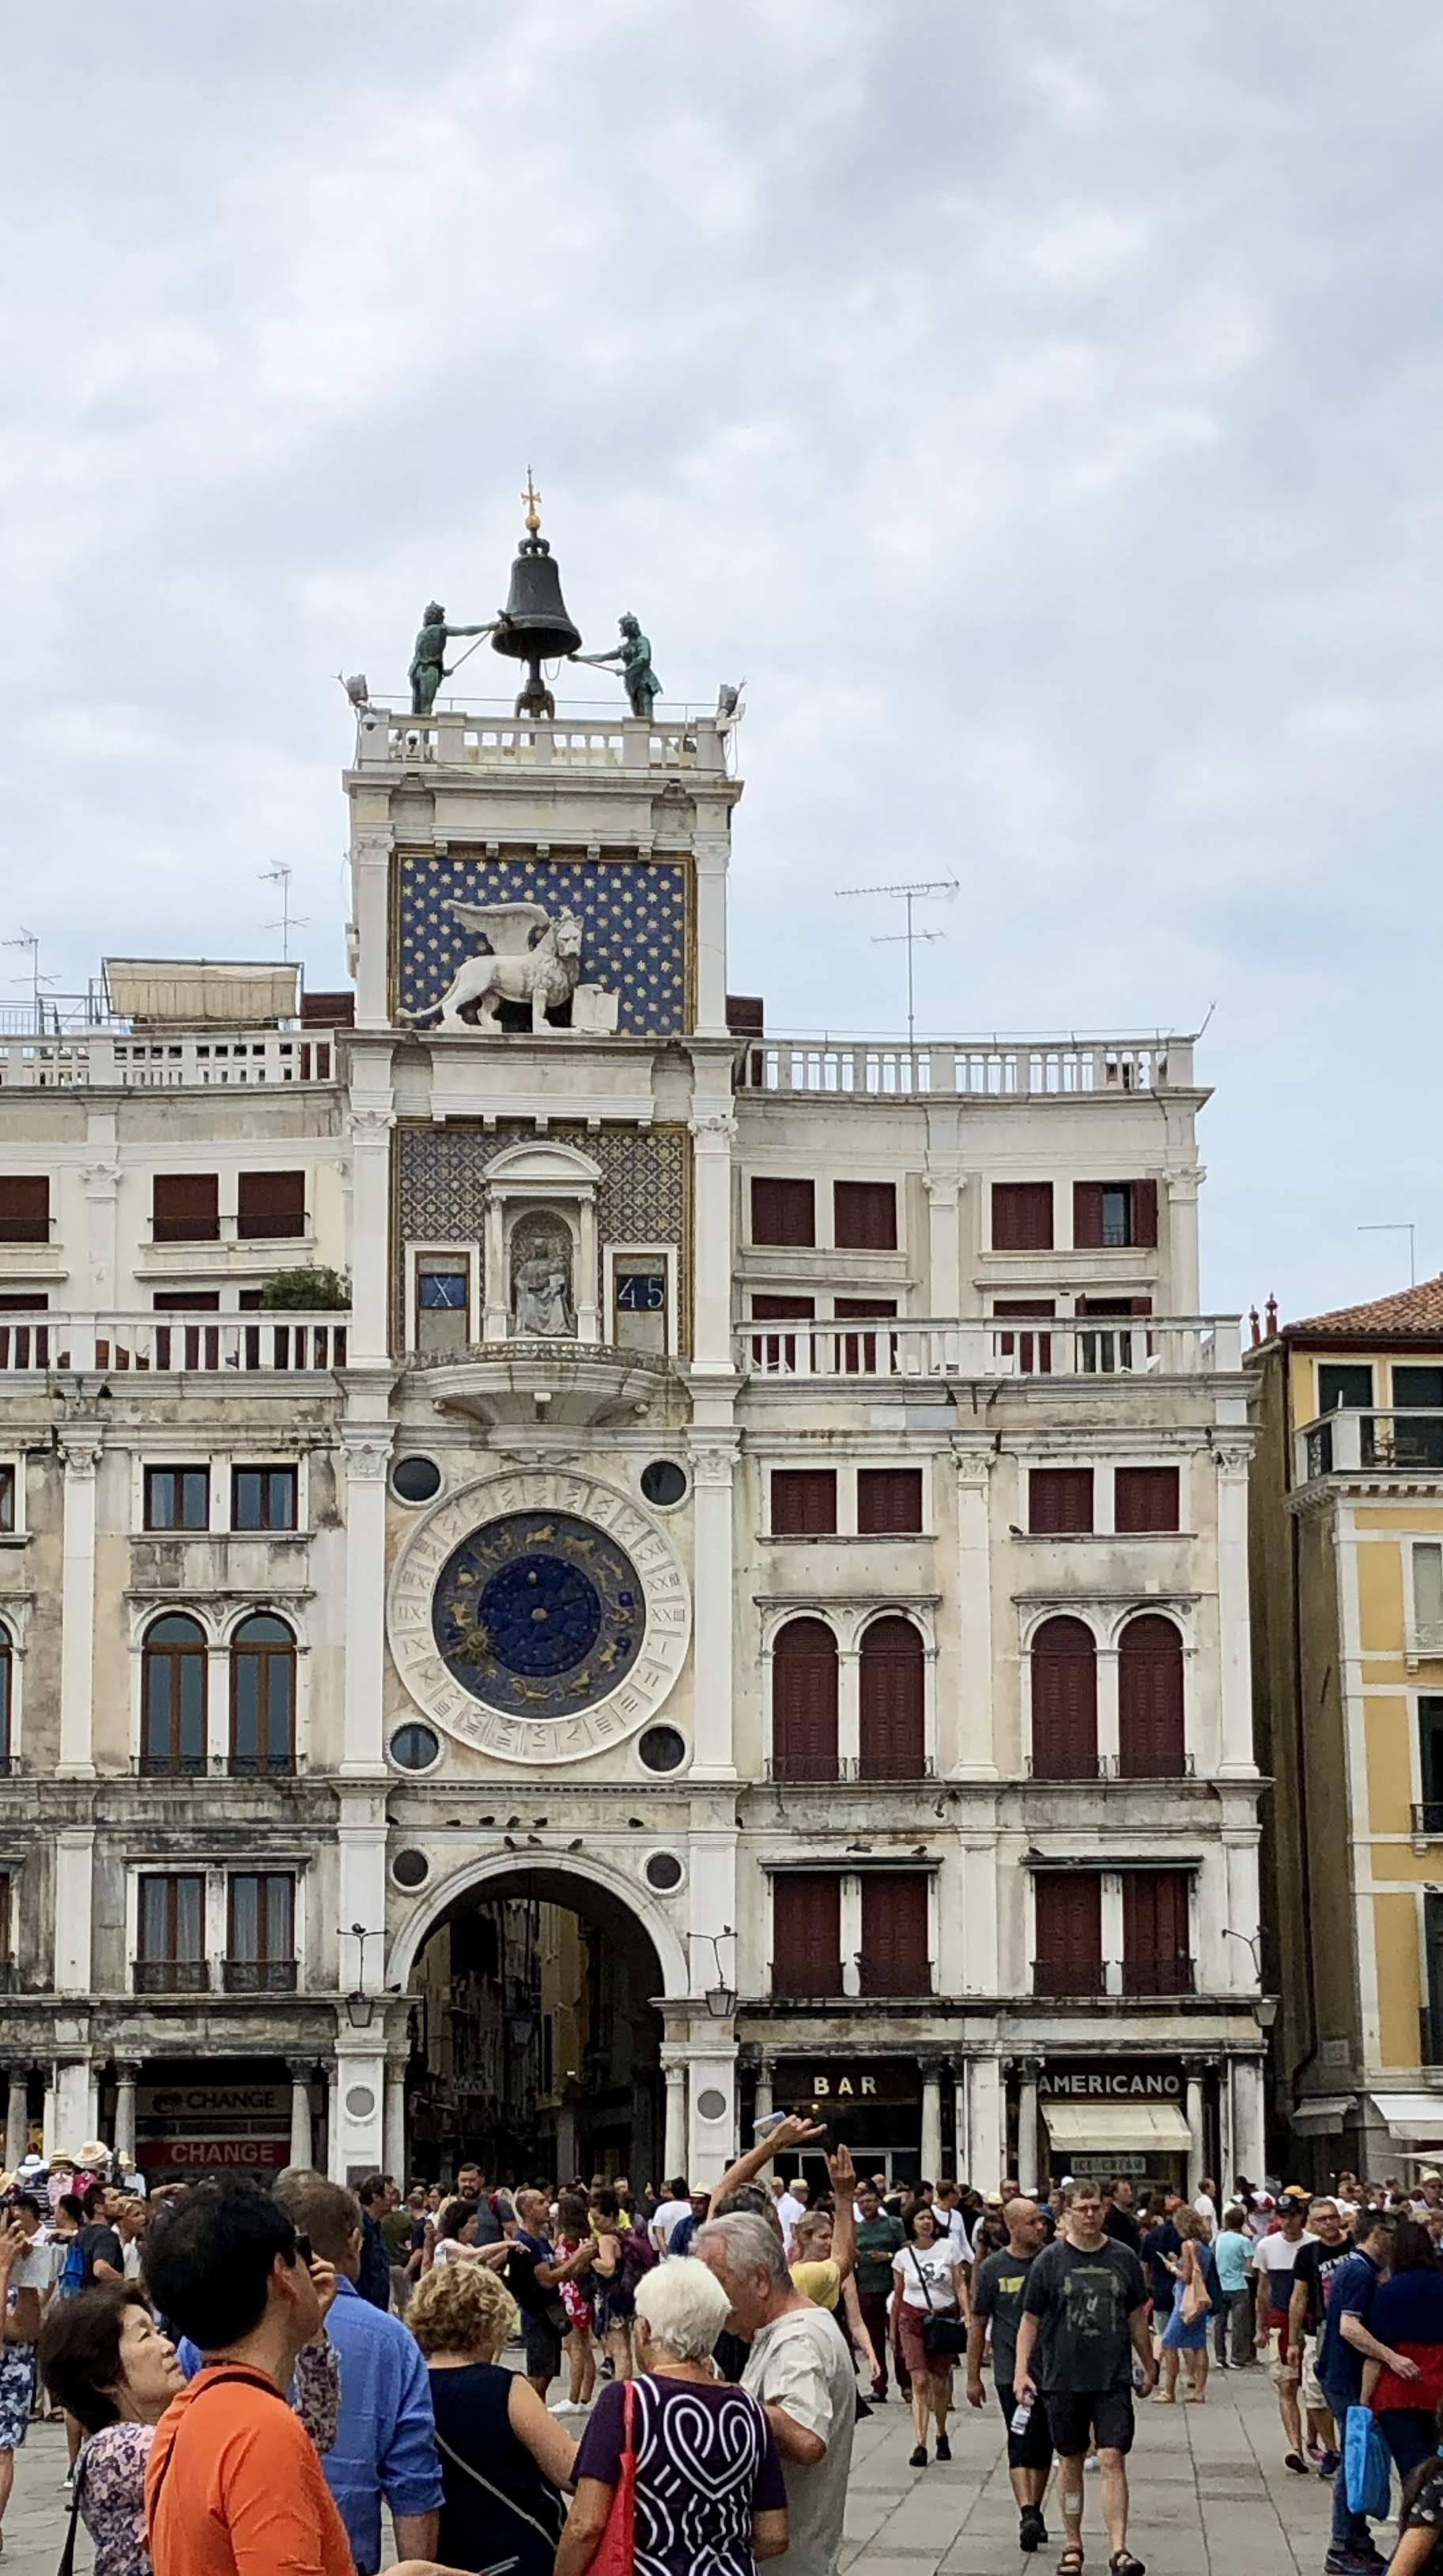 San Marco clock tower